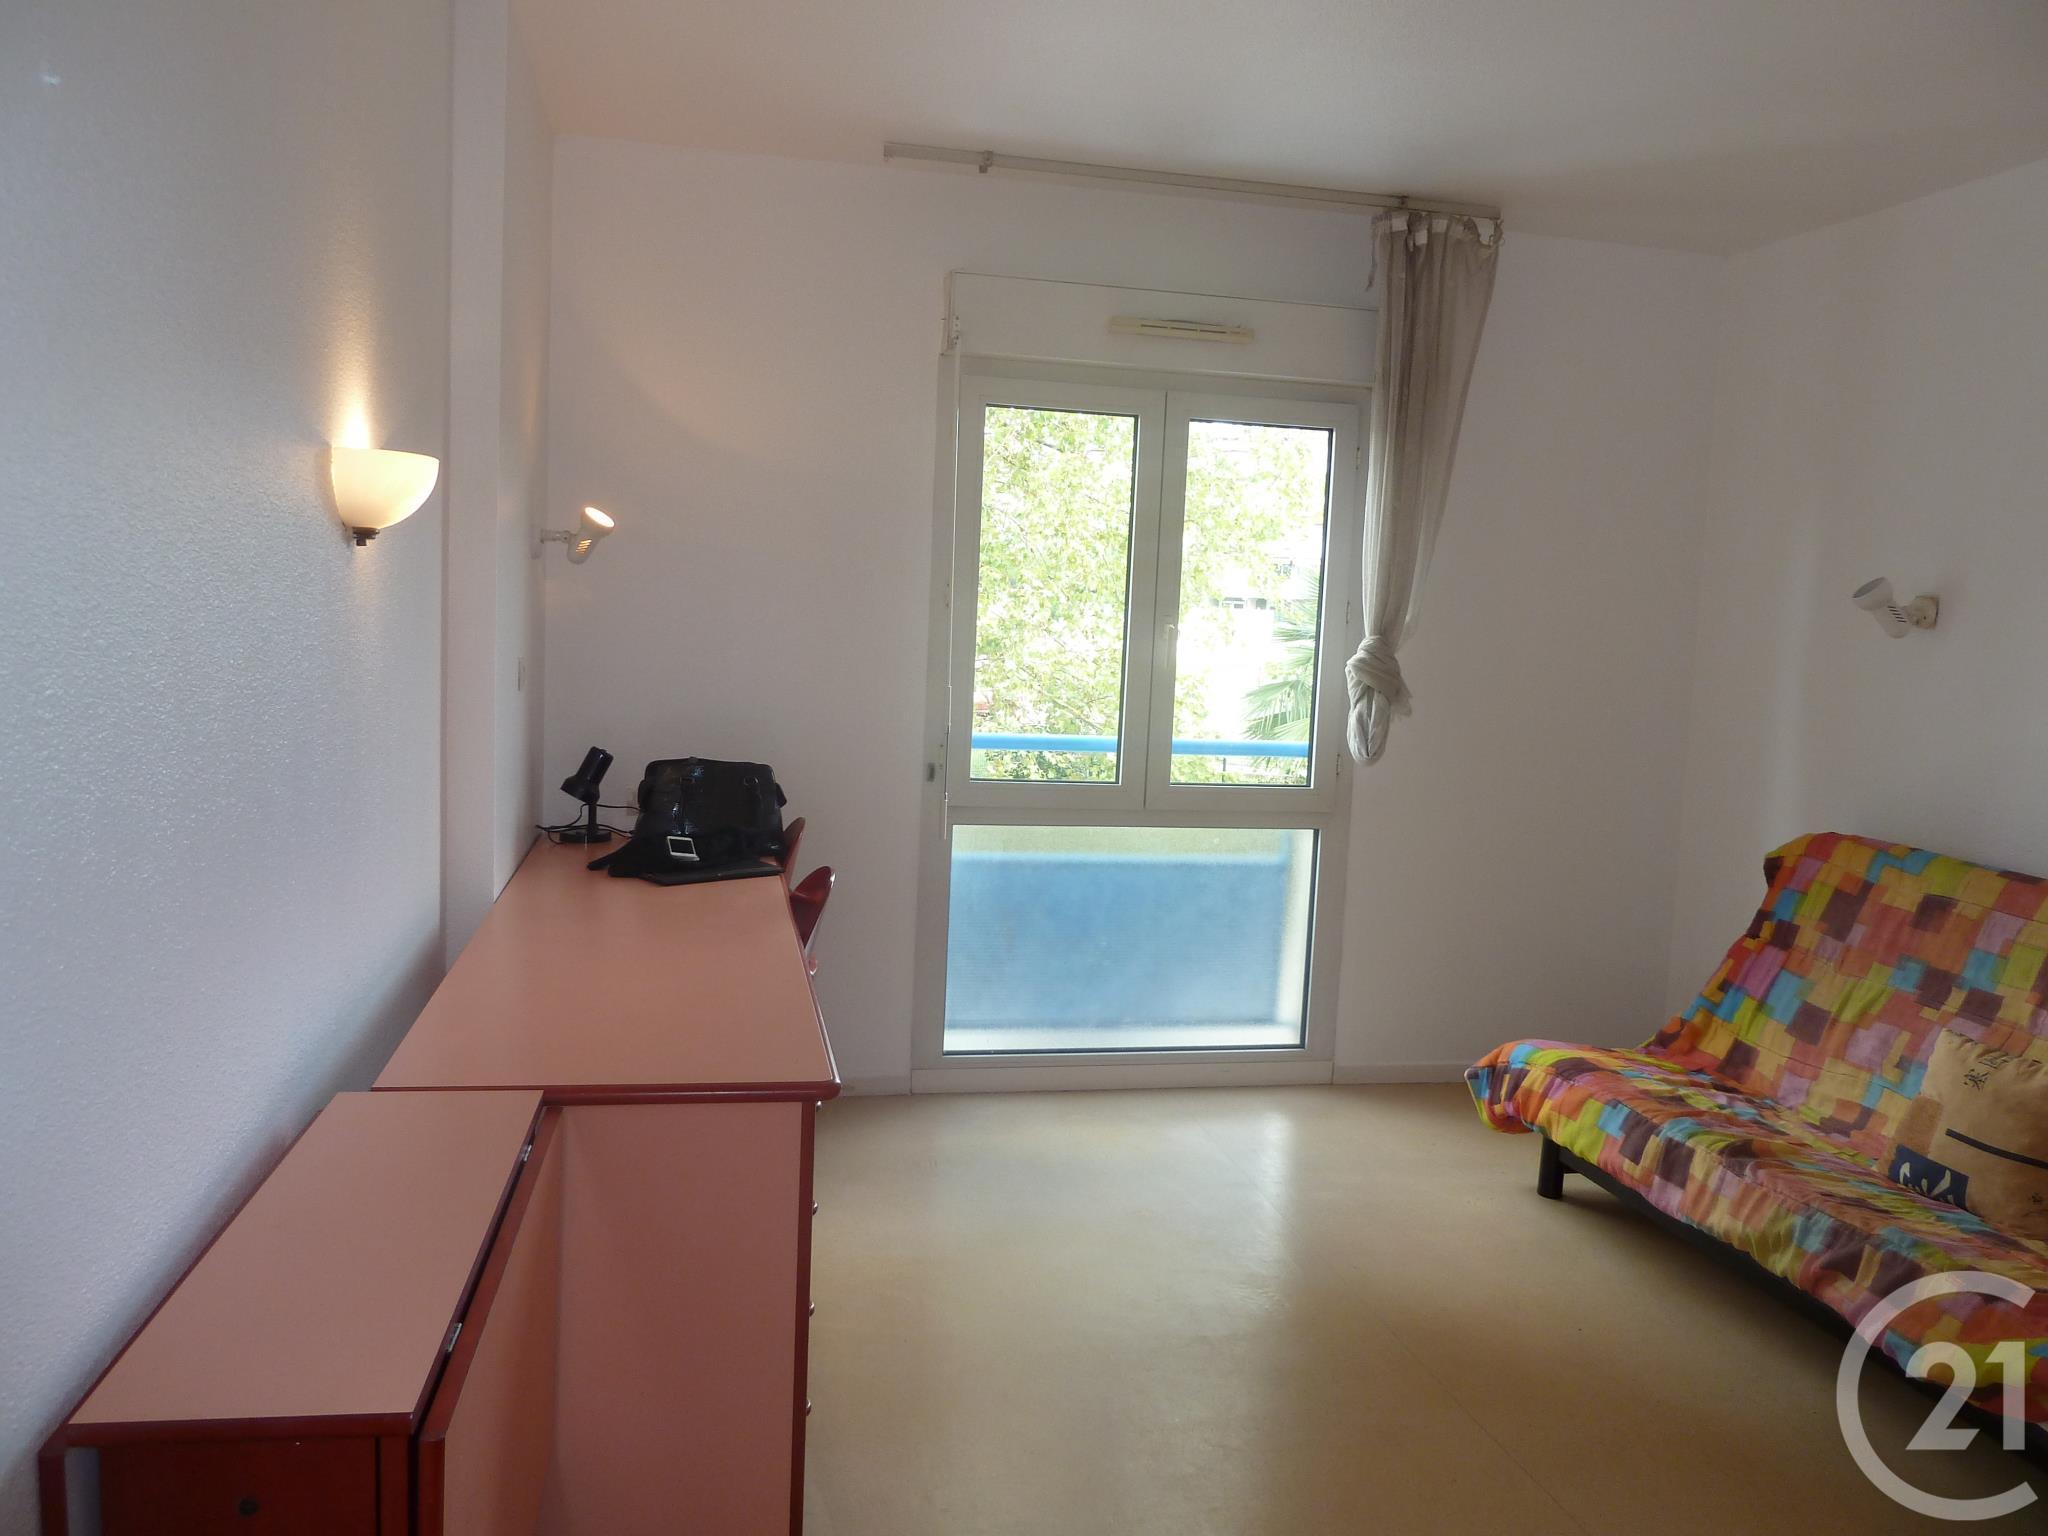 appartement f1 louer 1 pi ce 23 m2 montpellier 34 languedoc roussillon. Black Bedroom Furniture Sets. Home Design Ideas